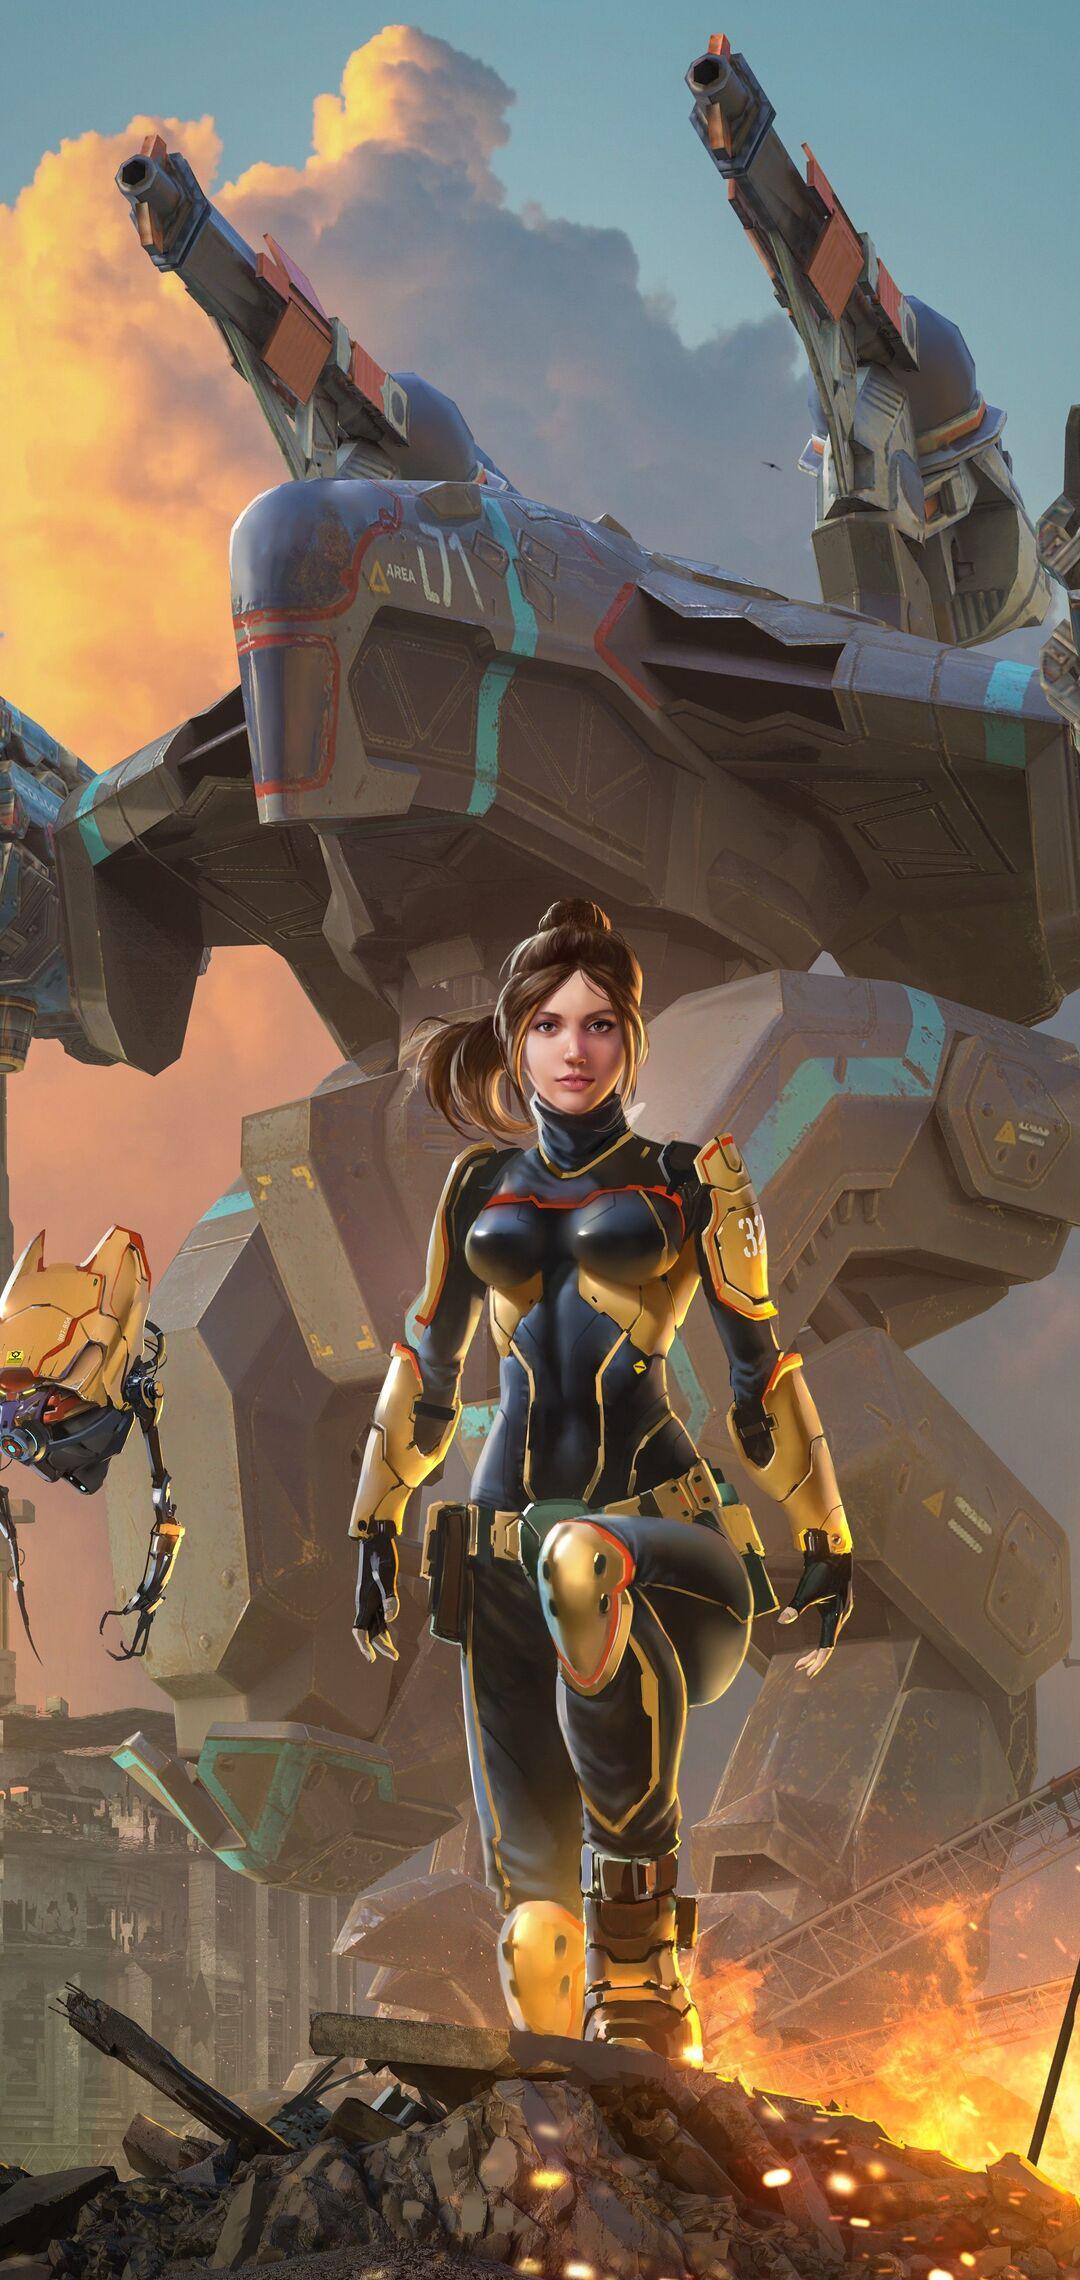 warrior-fantasy-girl-with-robot-4k-lu.jpg